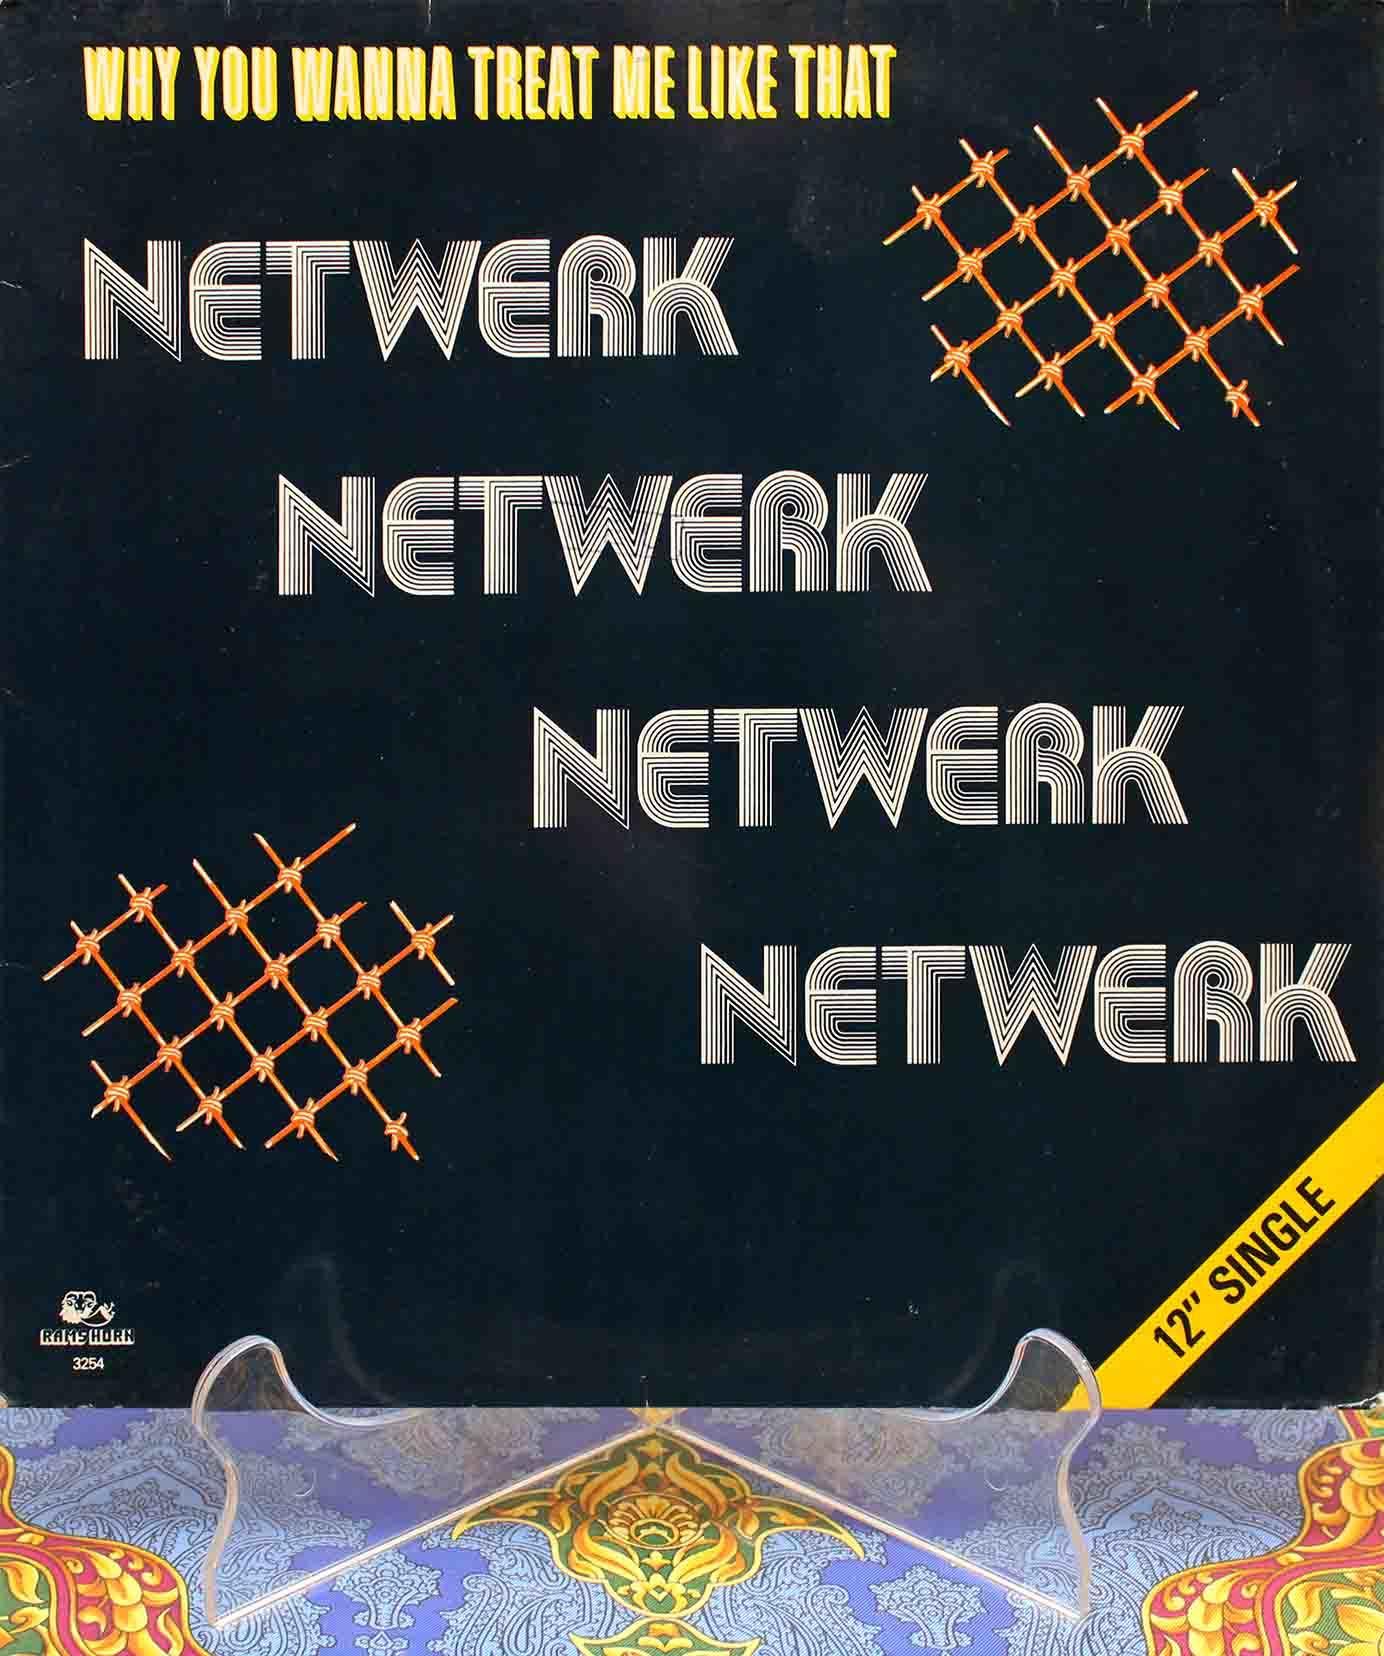 Netwerk – Why You Wanna Treat Me Like That 01